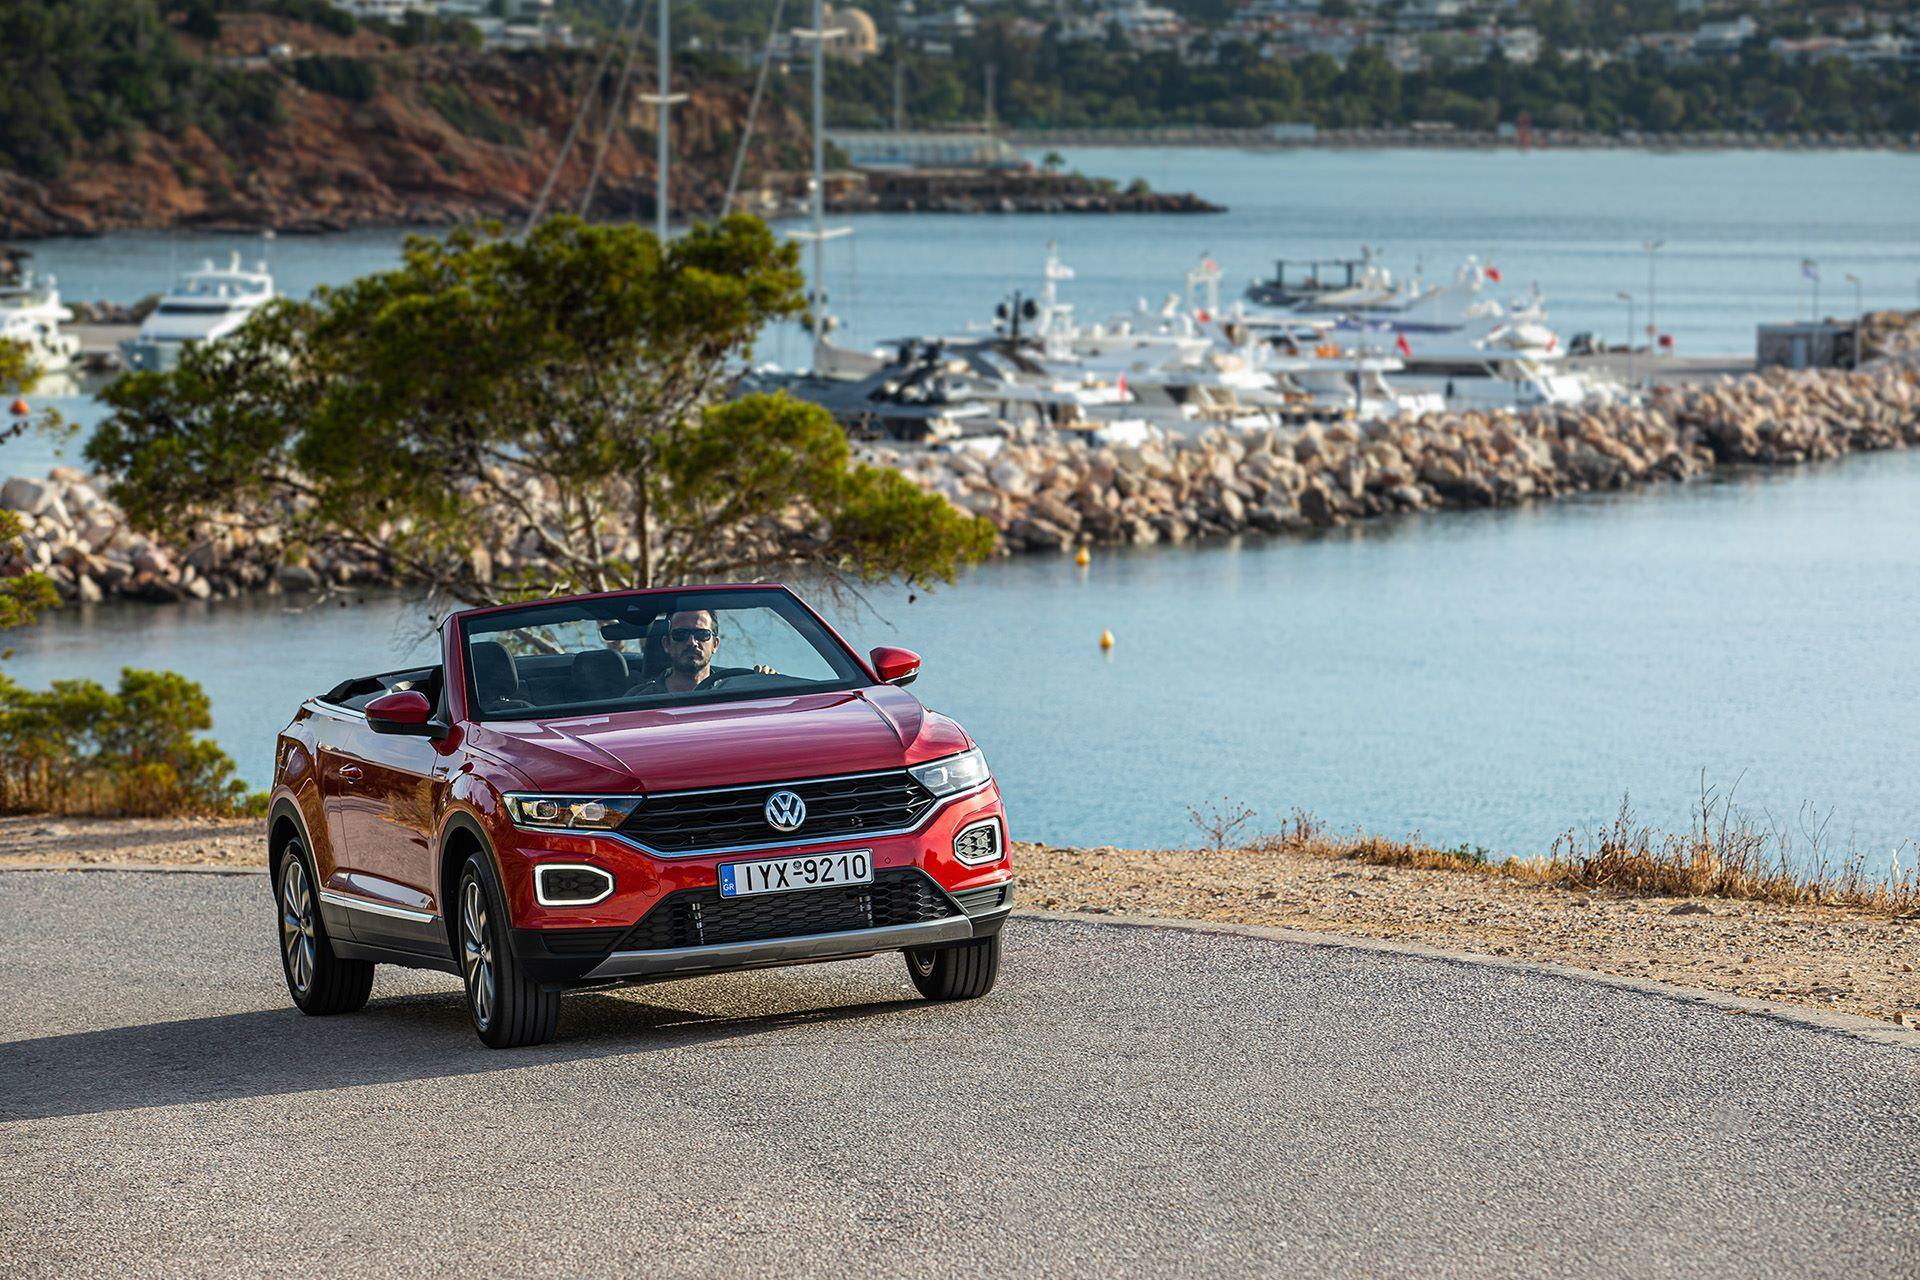 Volkswagen-T-Roc-Cabriolet-Greece-55